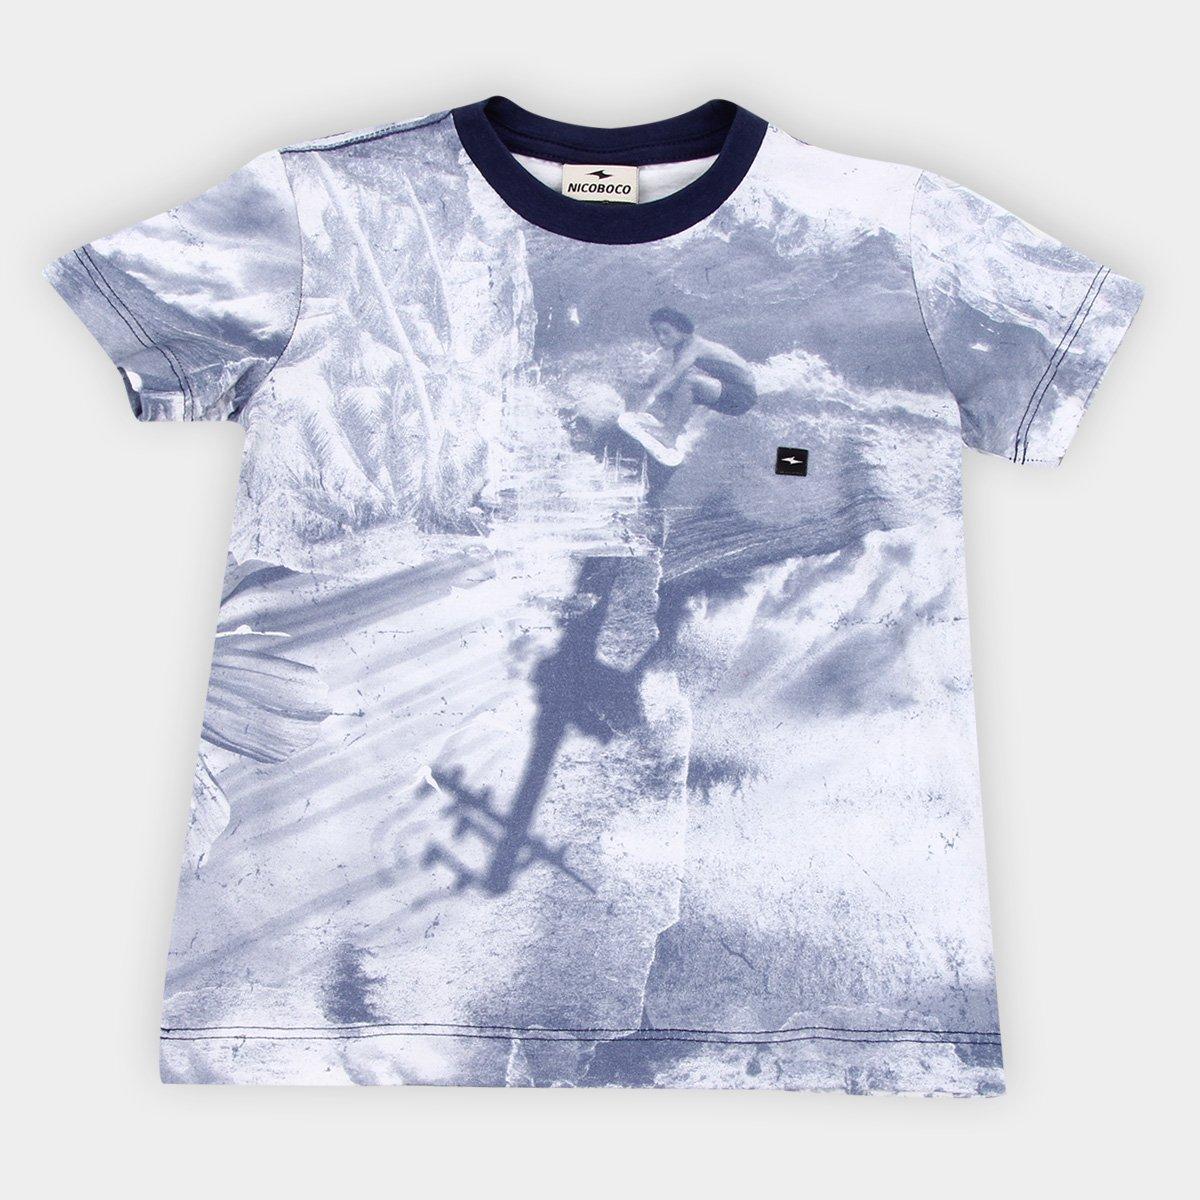 Camiseta Digital Infantil Nicoboco Monferno Masculina